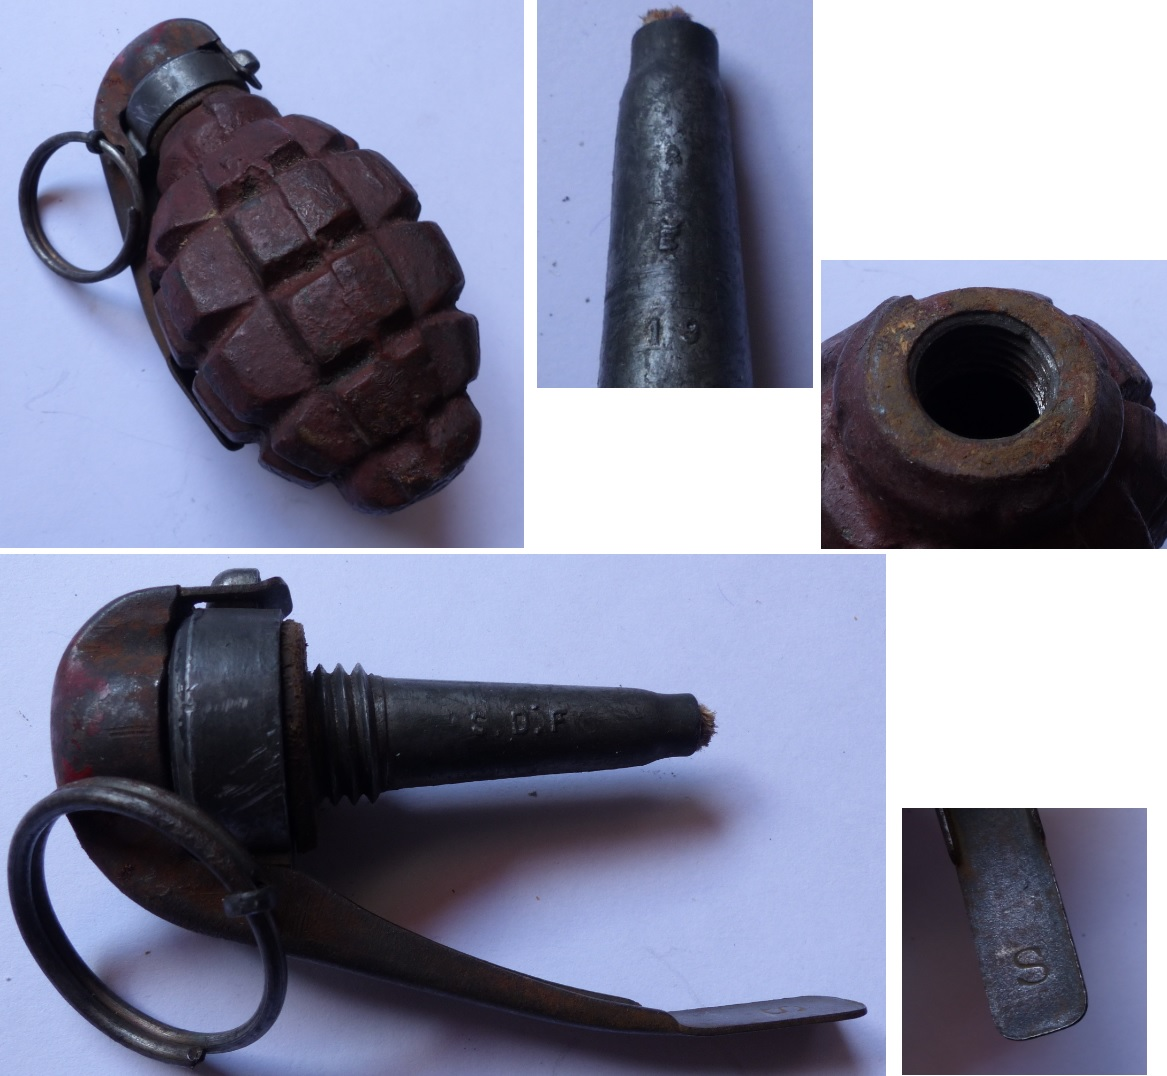 Grenade F1 modèle 1915 F1